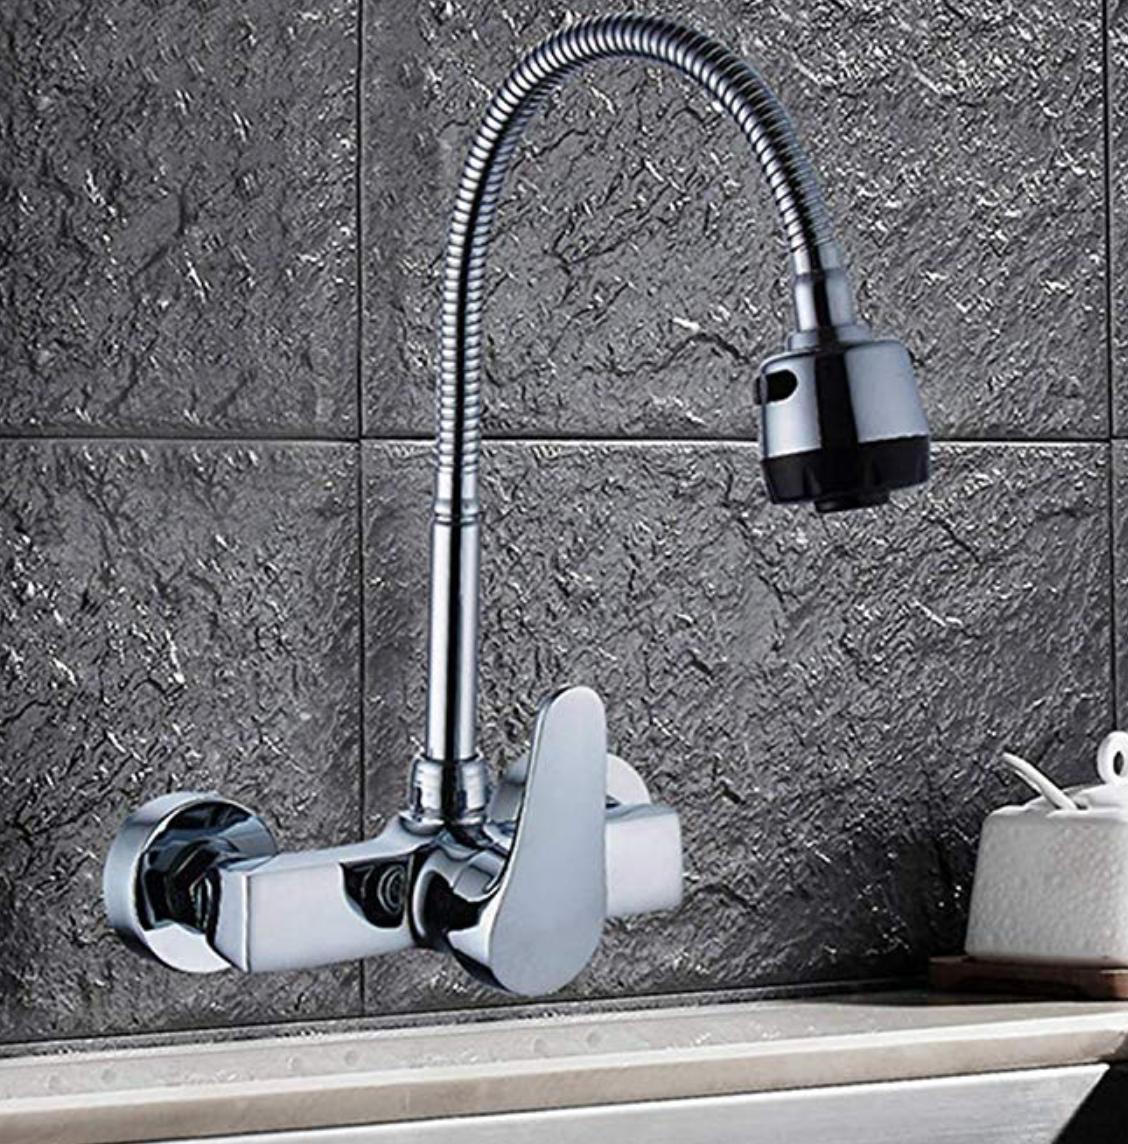 Fzhlr Kitchen Faucet Chrome Wall Mounted Brass Mixer Tap Single Handles Brass Bathroom Sink Faucet Mixer Basi Brass Bathroom Kitchen Taps Chrome Kitchen Faucet